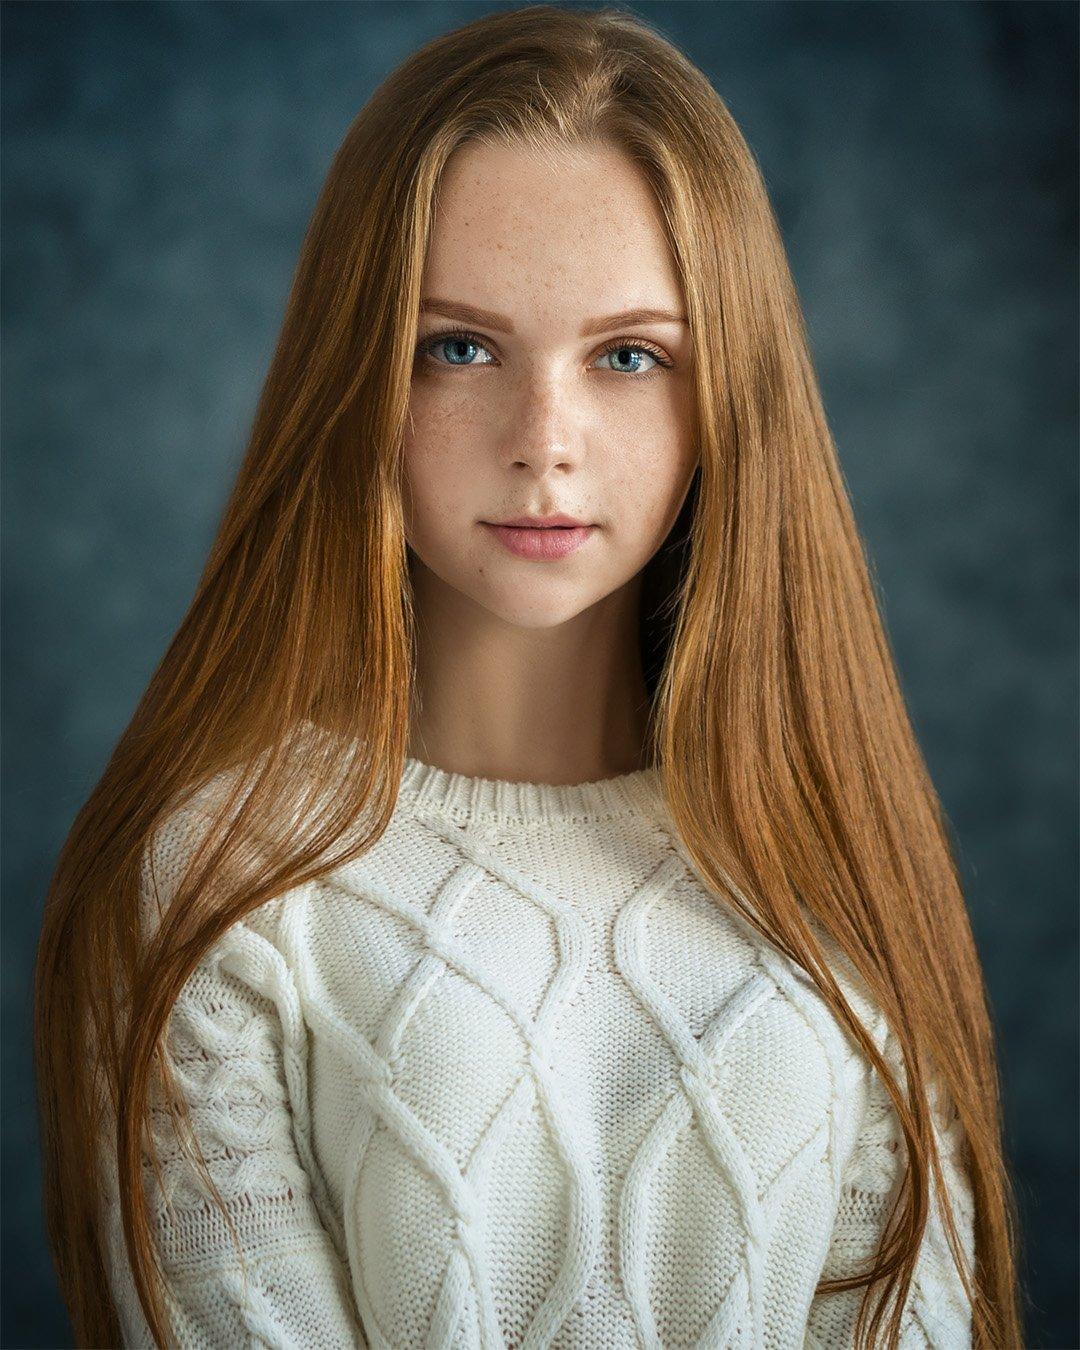 portait, mode, gir, портрет, модель, девушка, art, арт, Евгений Сибиряев